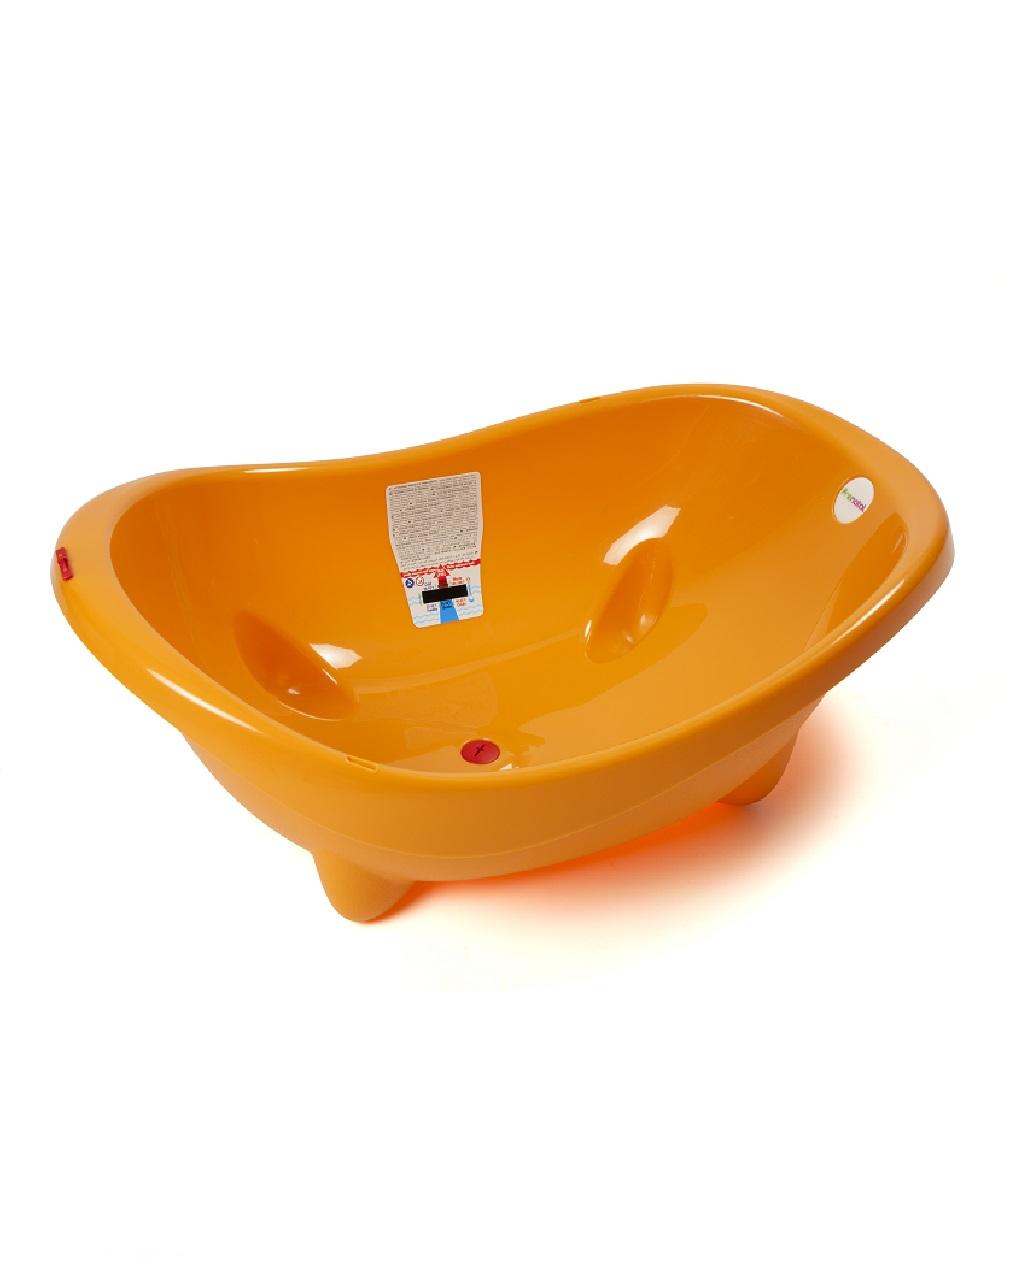 Giordani Μπανάκι Soap-Bubble Πορτοκαλί